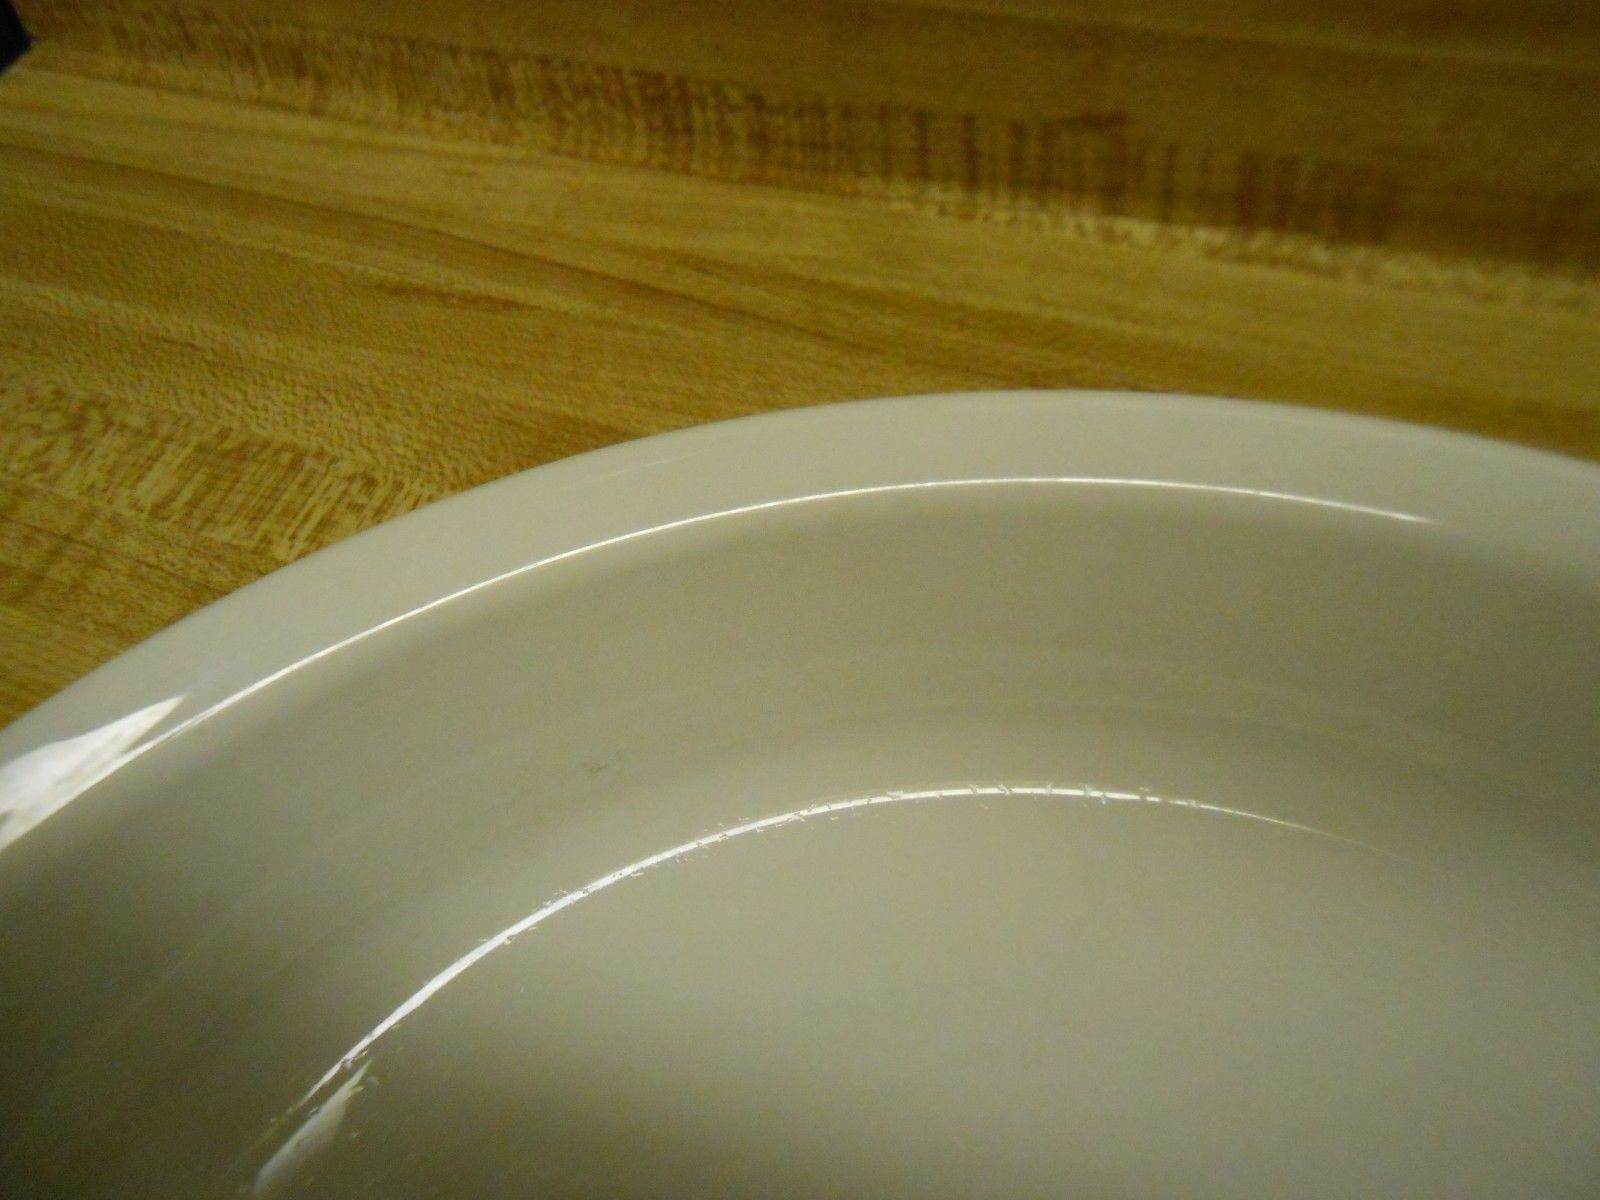 ... corning ware pie pan Cornflower blue pattern 9  pie pan microwave safe ... & corning ware pie pan Cornflower blue pattern and 50 similar items